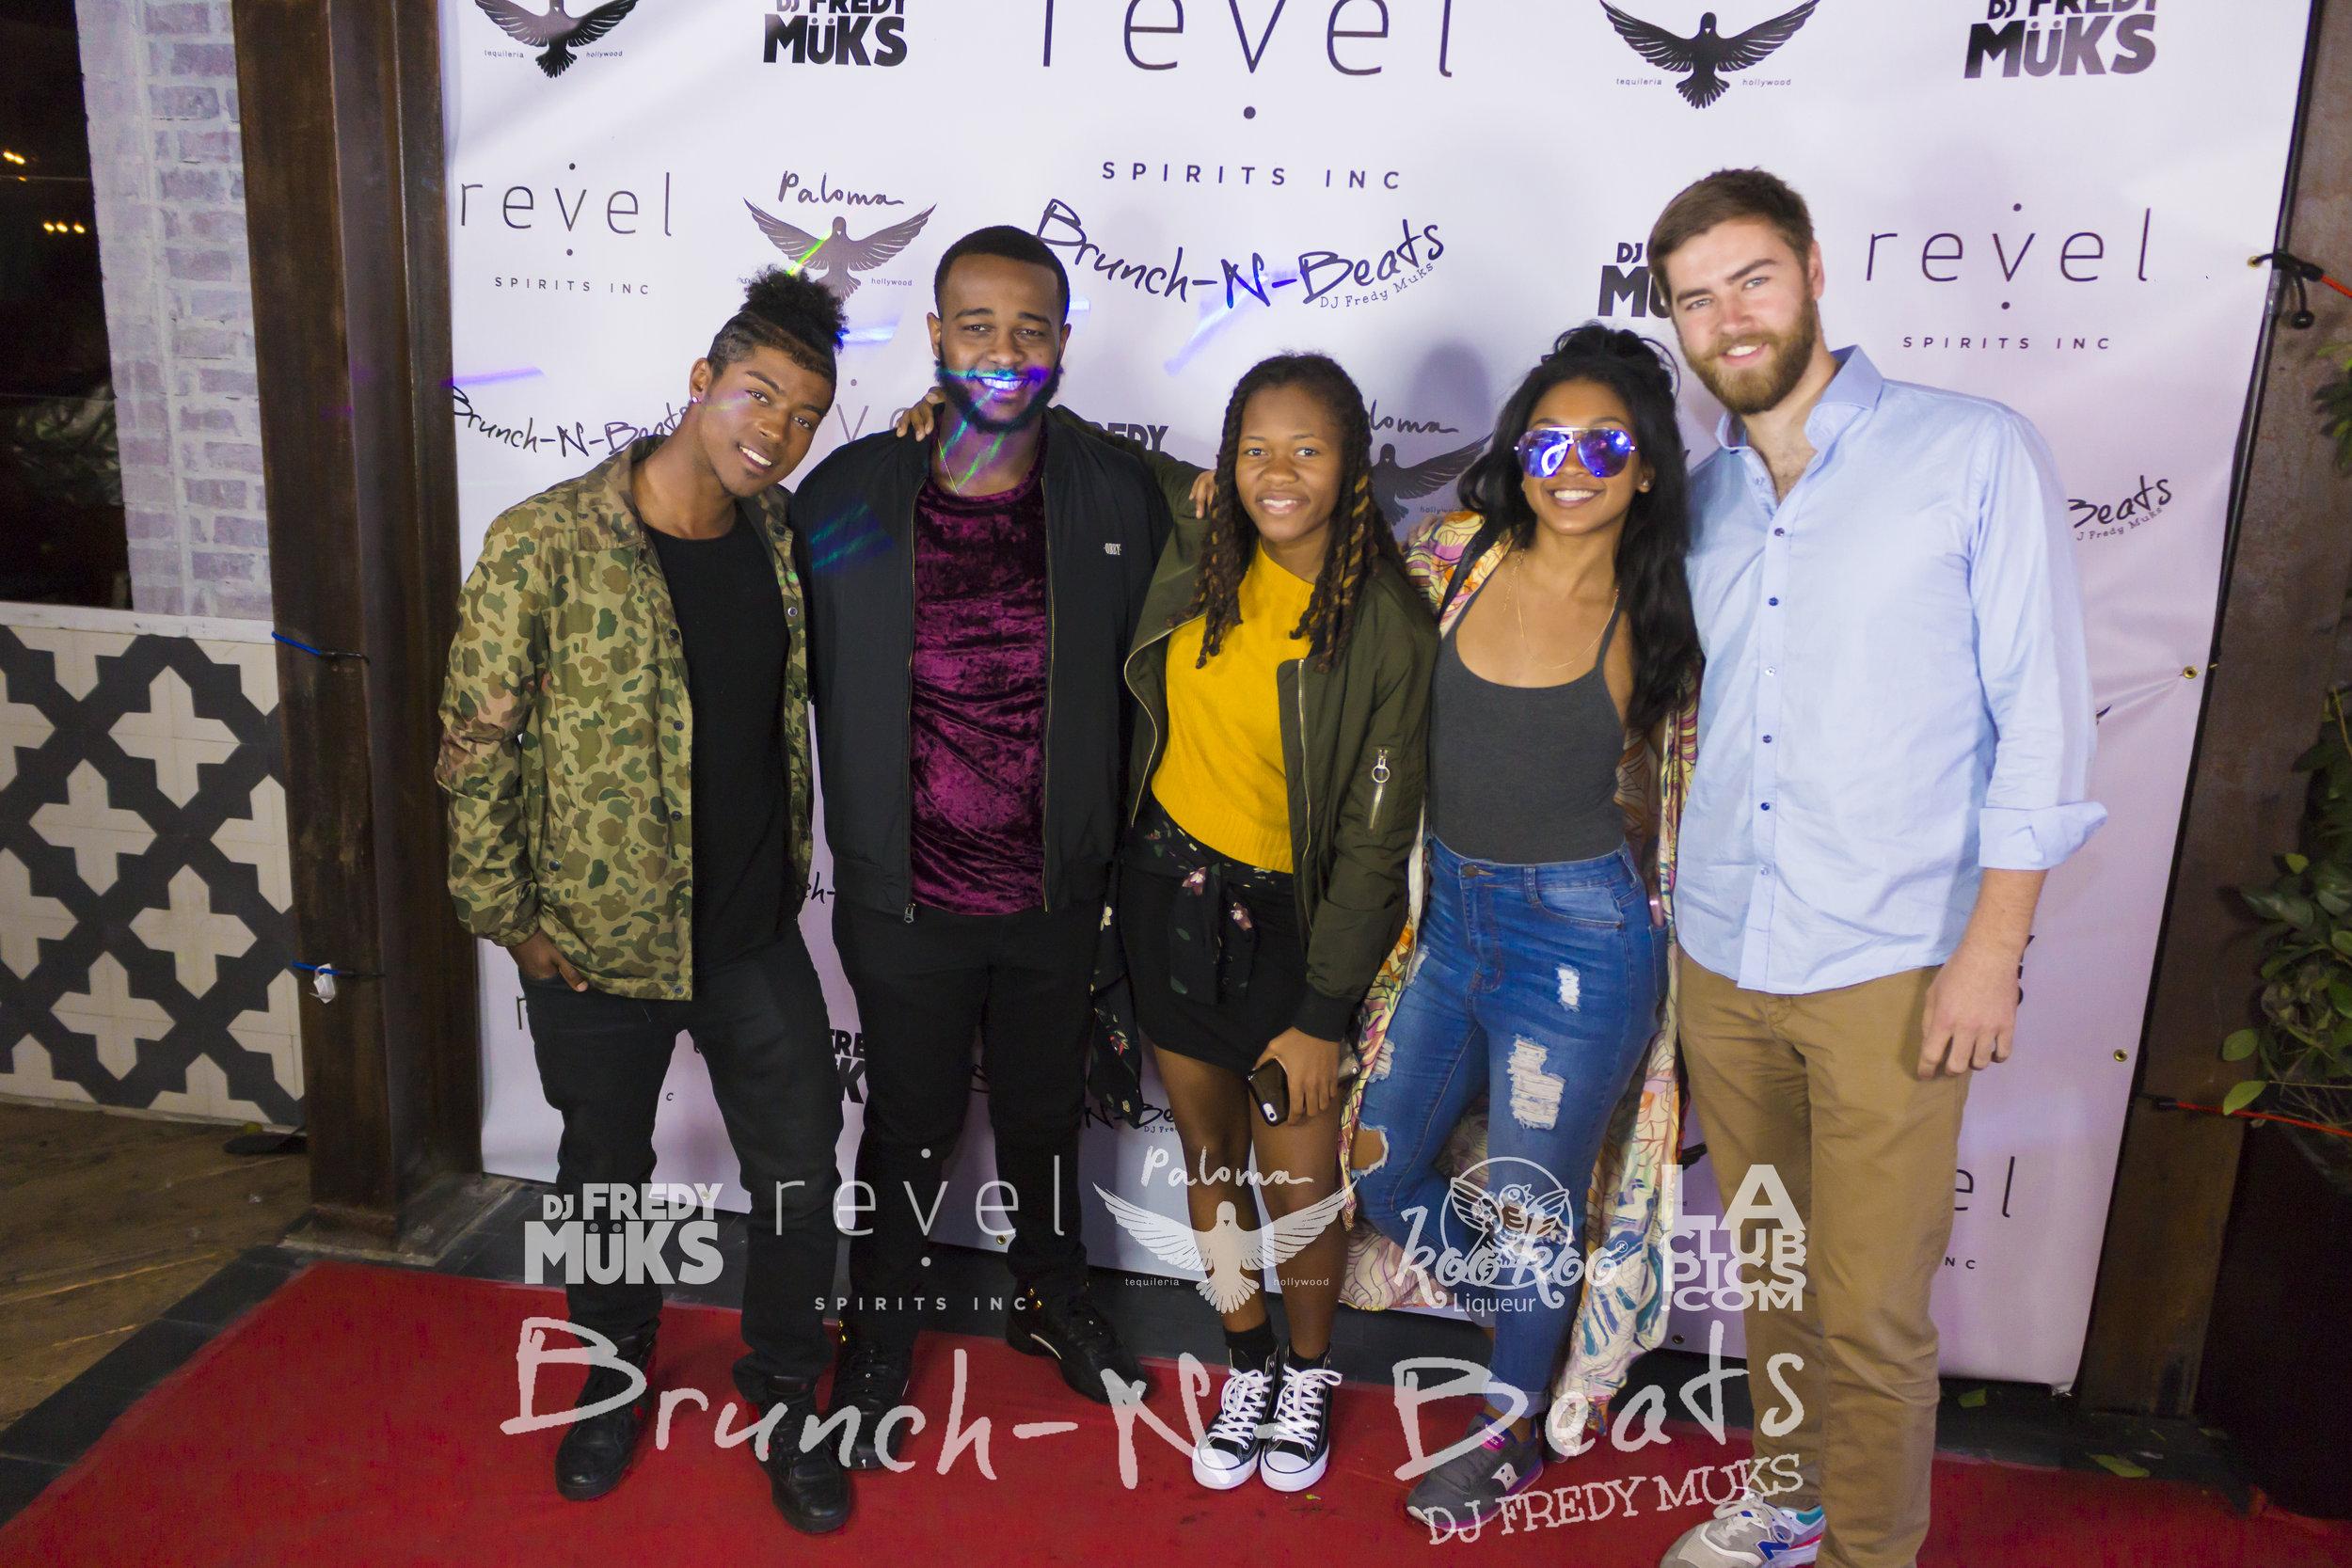 Brunch-N-Beats - Paloma Hollywood - 02-25-18_130.jpg